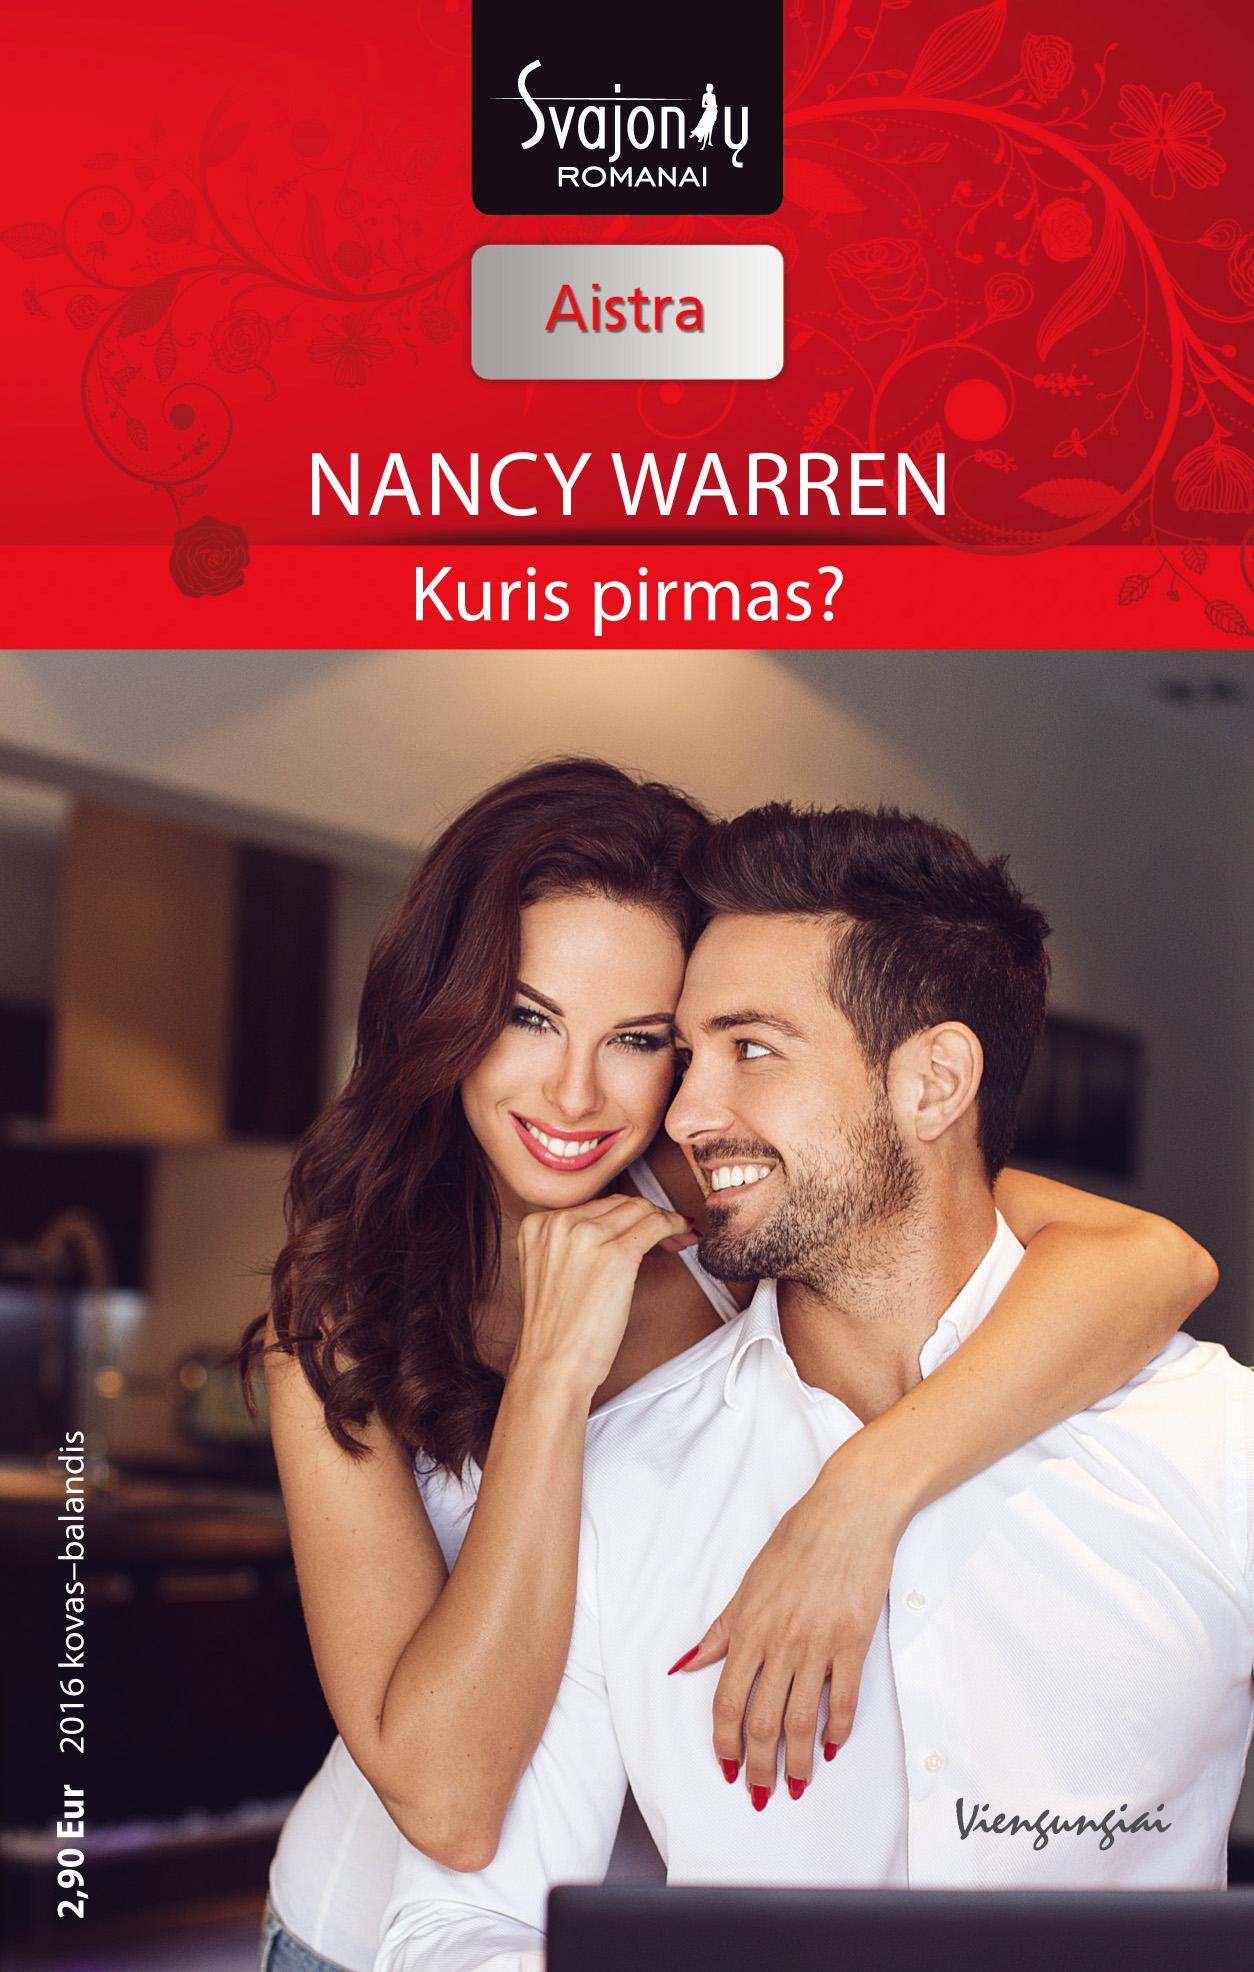 Nancy Warren Kuris pirmas? перро ш красная шапочка isbn 9785699888894 page 7